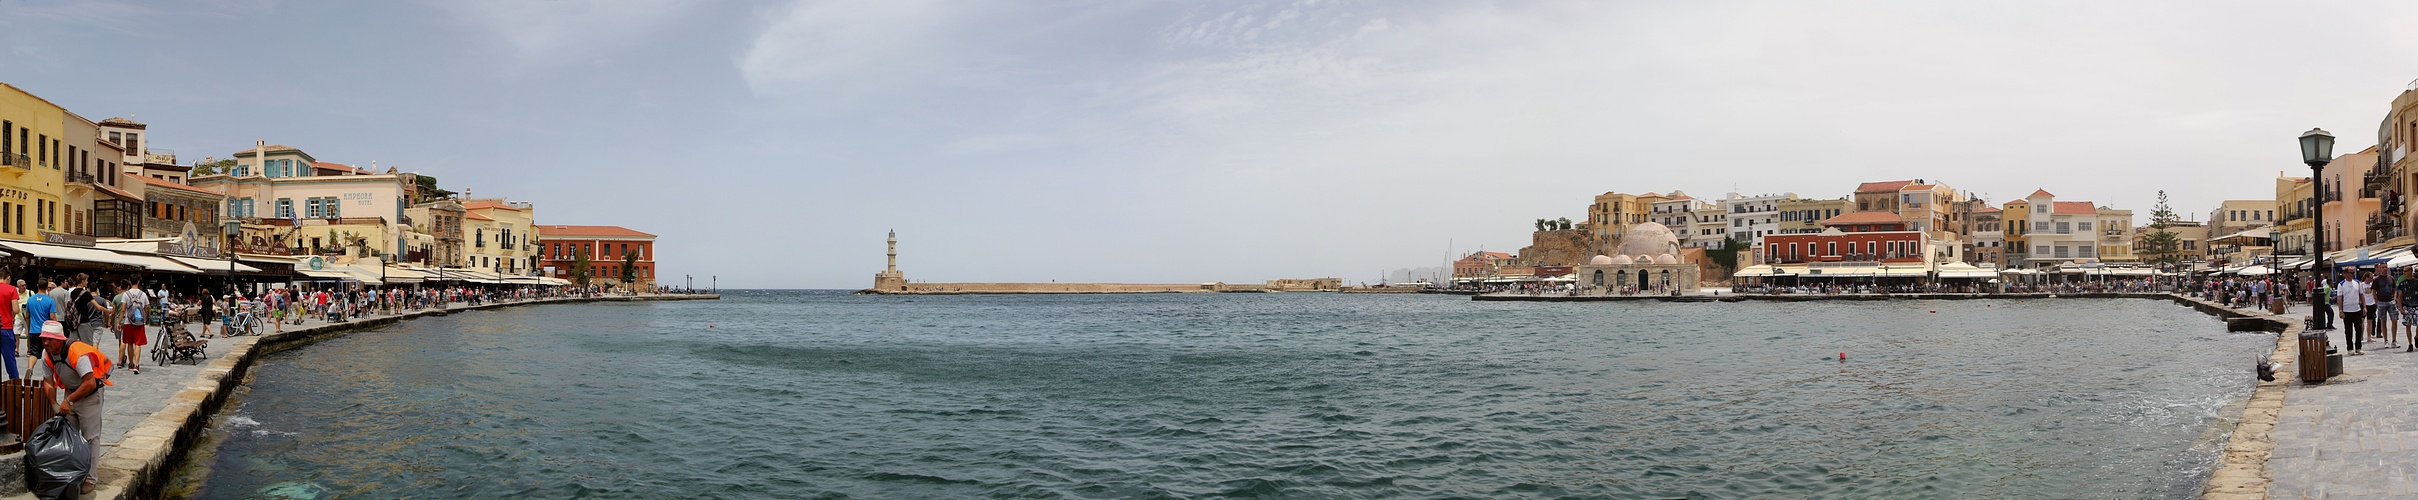 Chania - Venezianischer Hafen